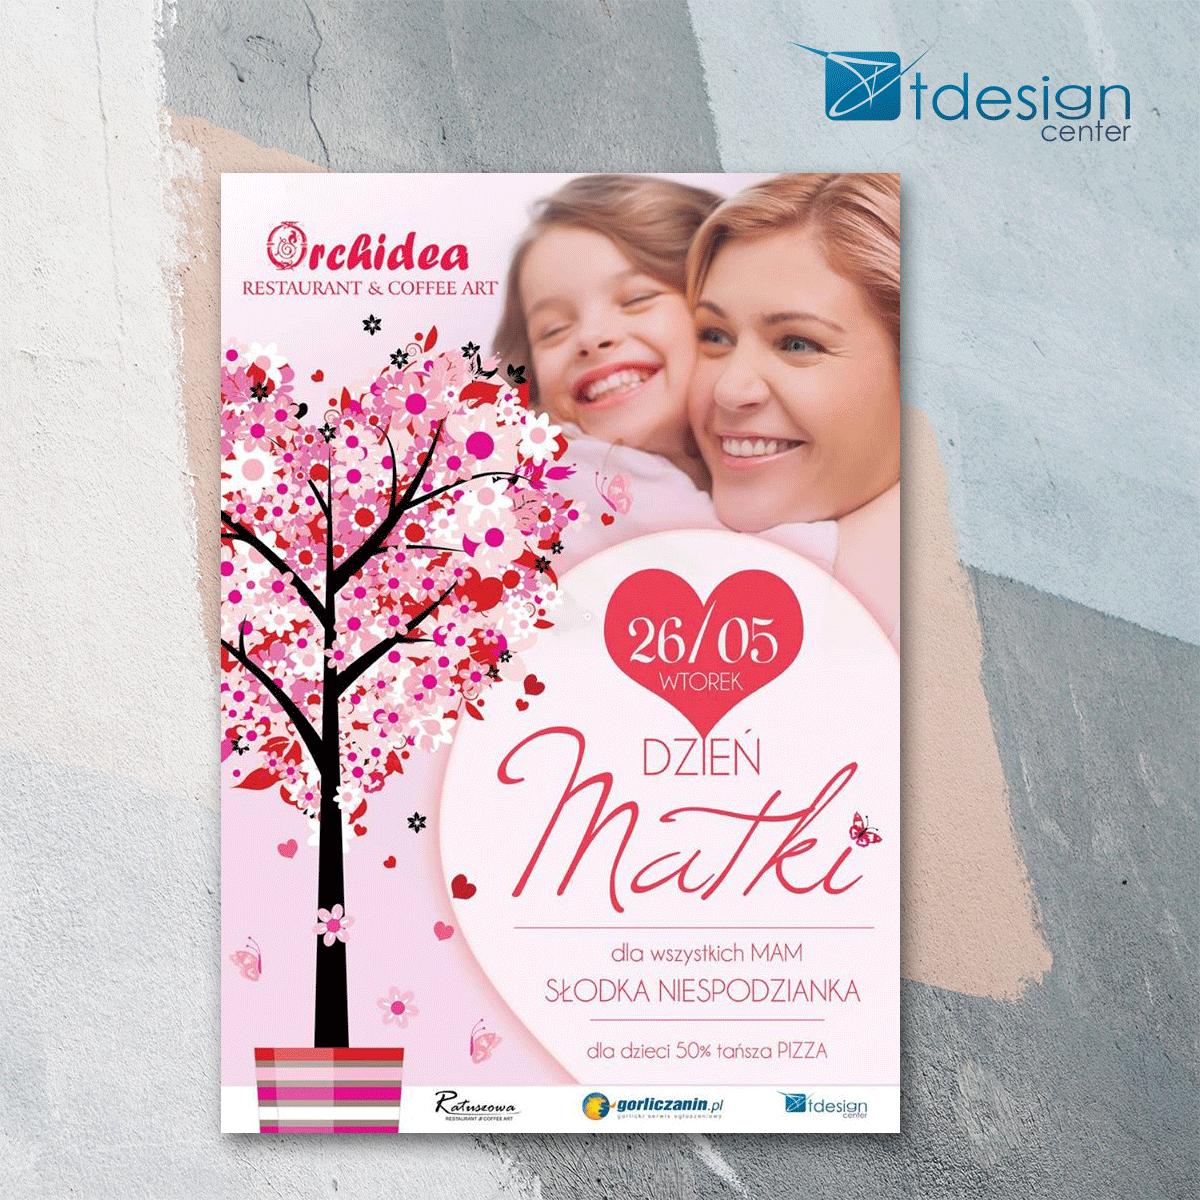 Plakat A3, projekt wykonany dla restauracji Orchidea